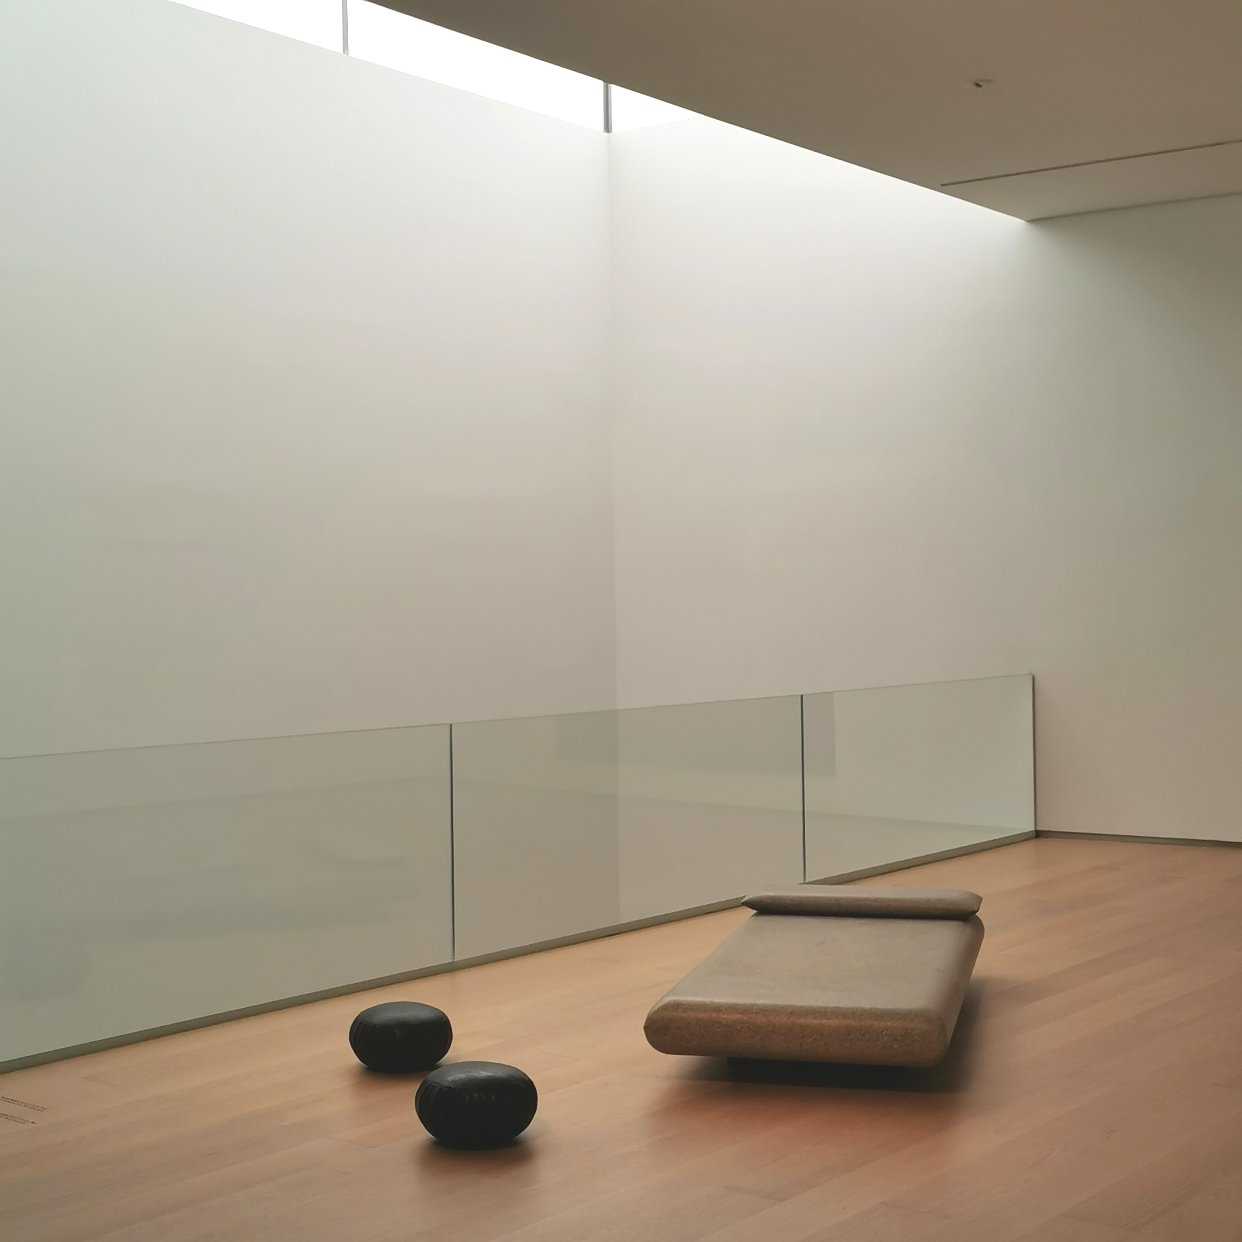 MACA-当代艺术博物馆的一天